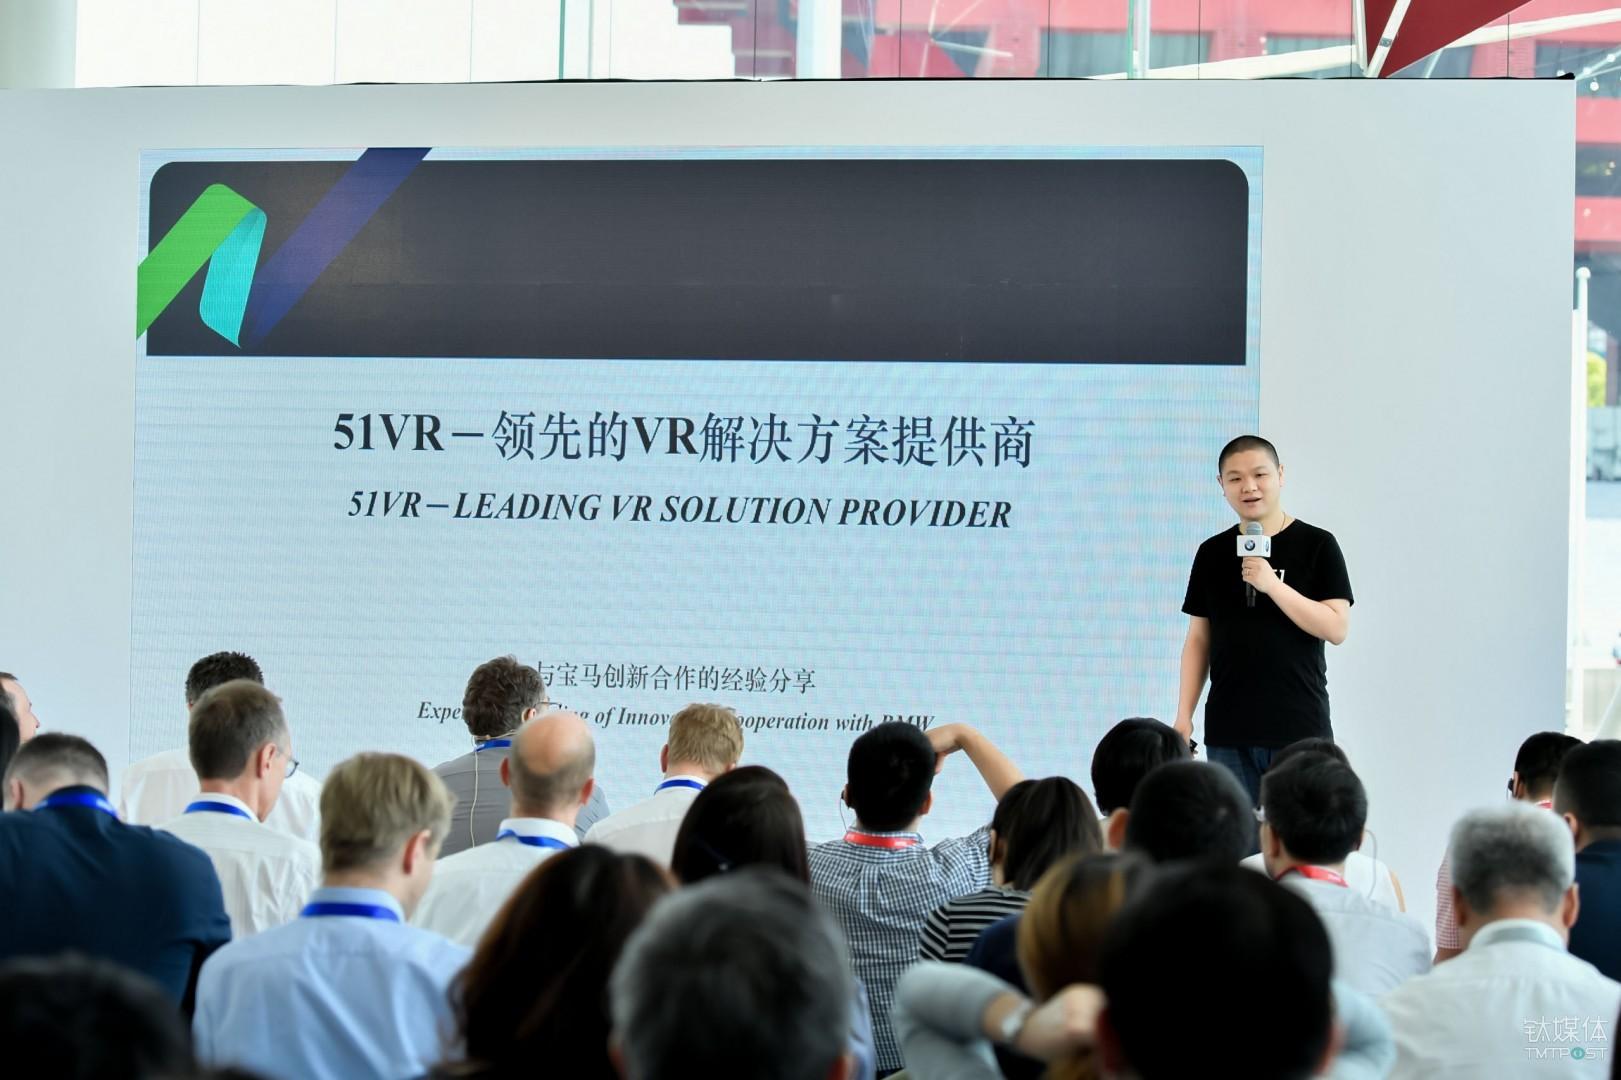 51VR子品牌realdrive创始人陈禄博士